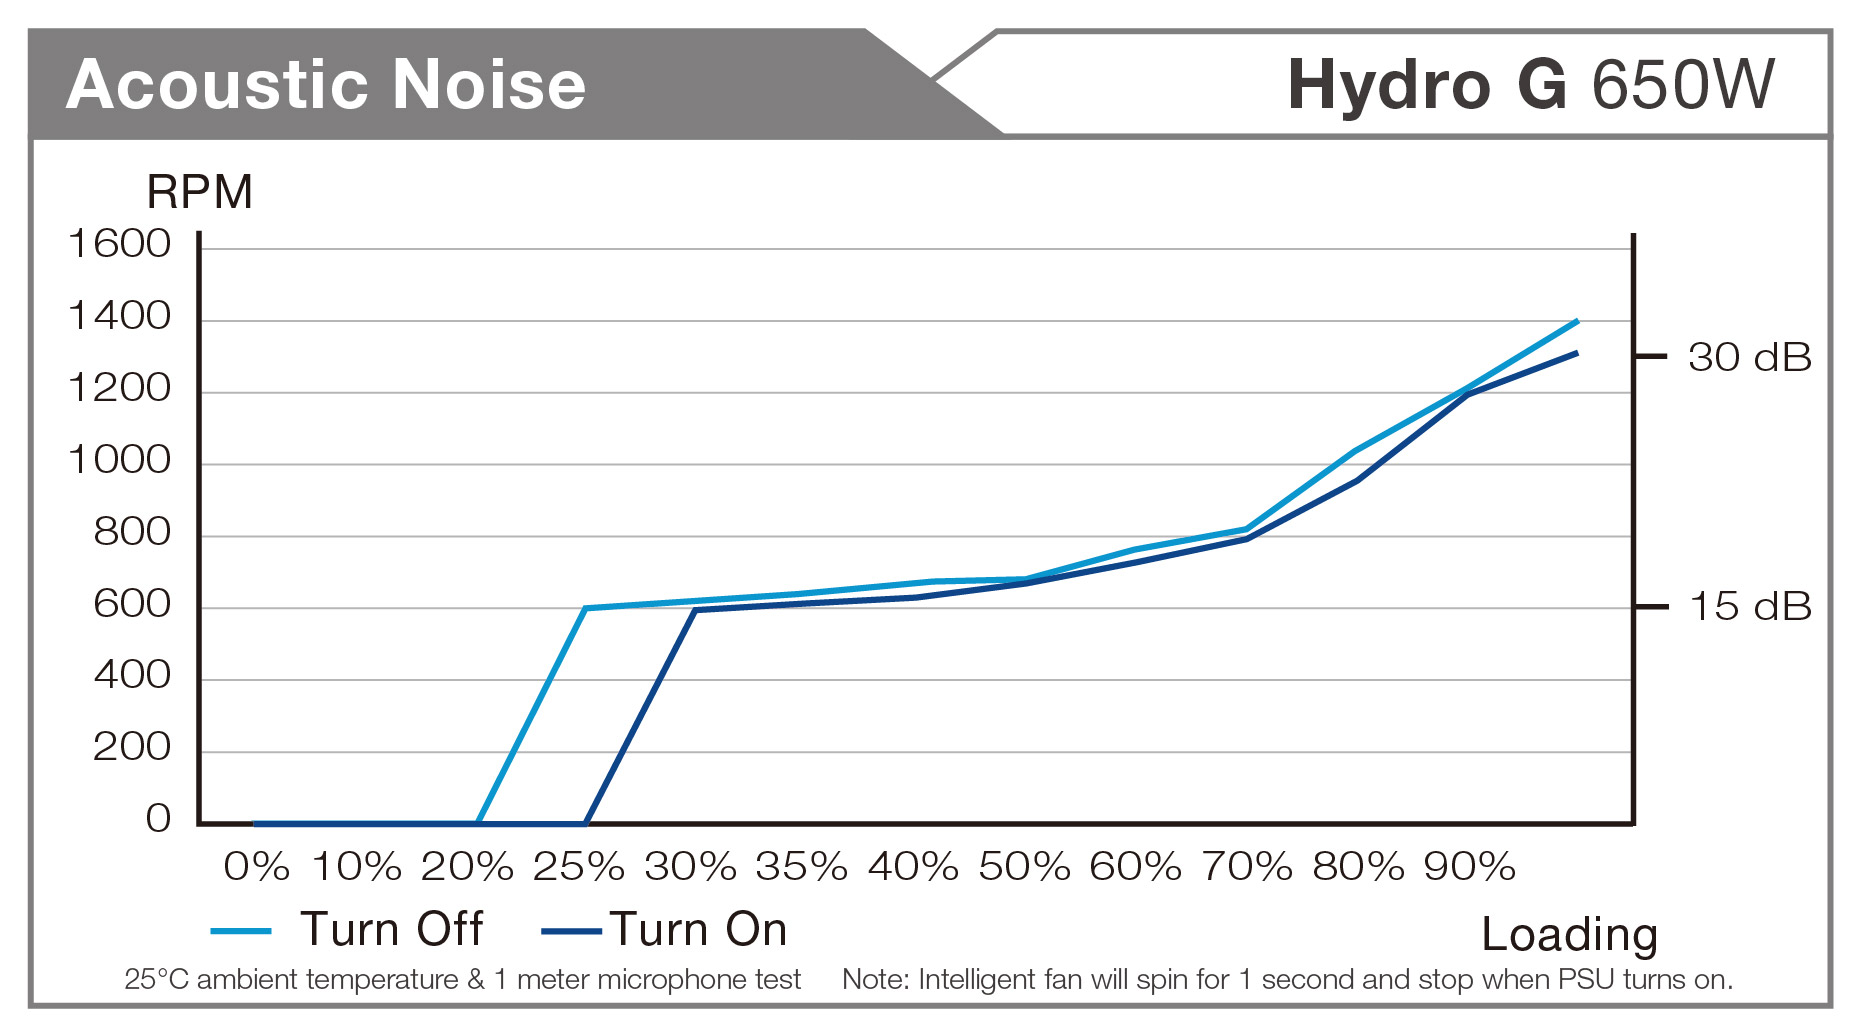 Hydro G 650w Power Supply Fsplifestyle Fsp Hexa Plus H2 400 Noise